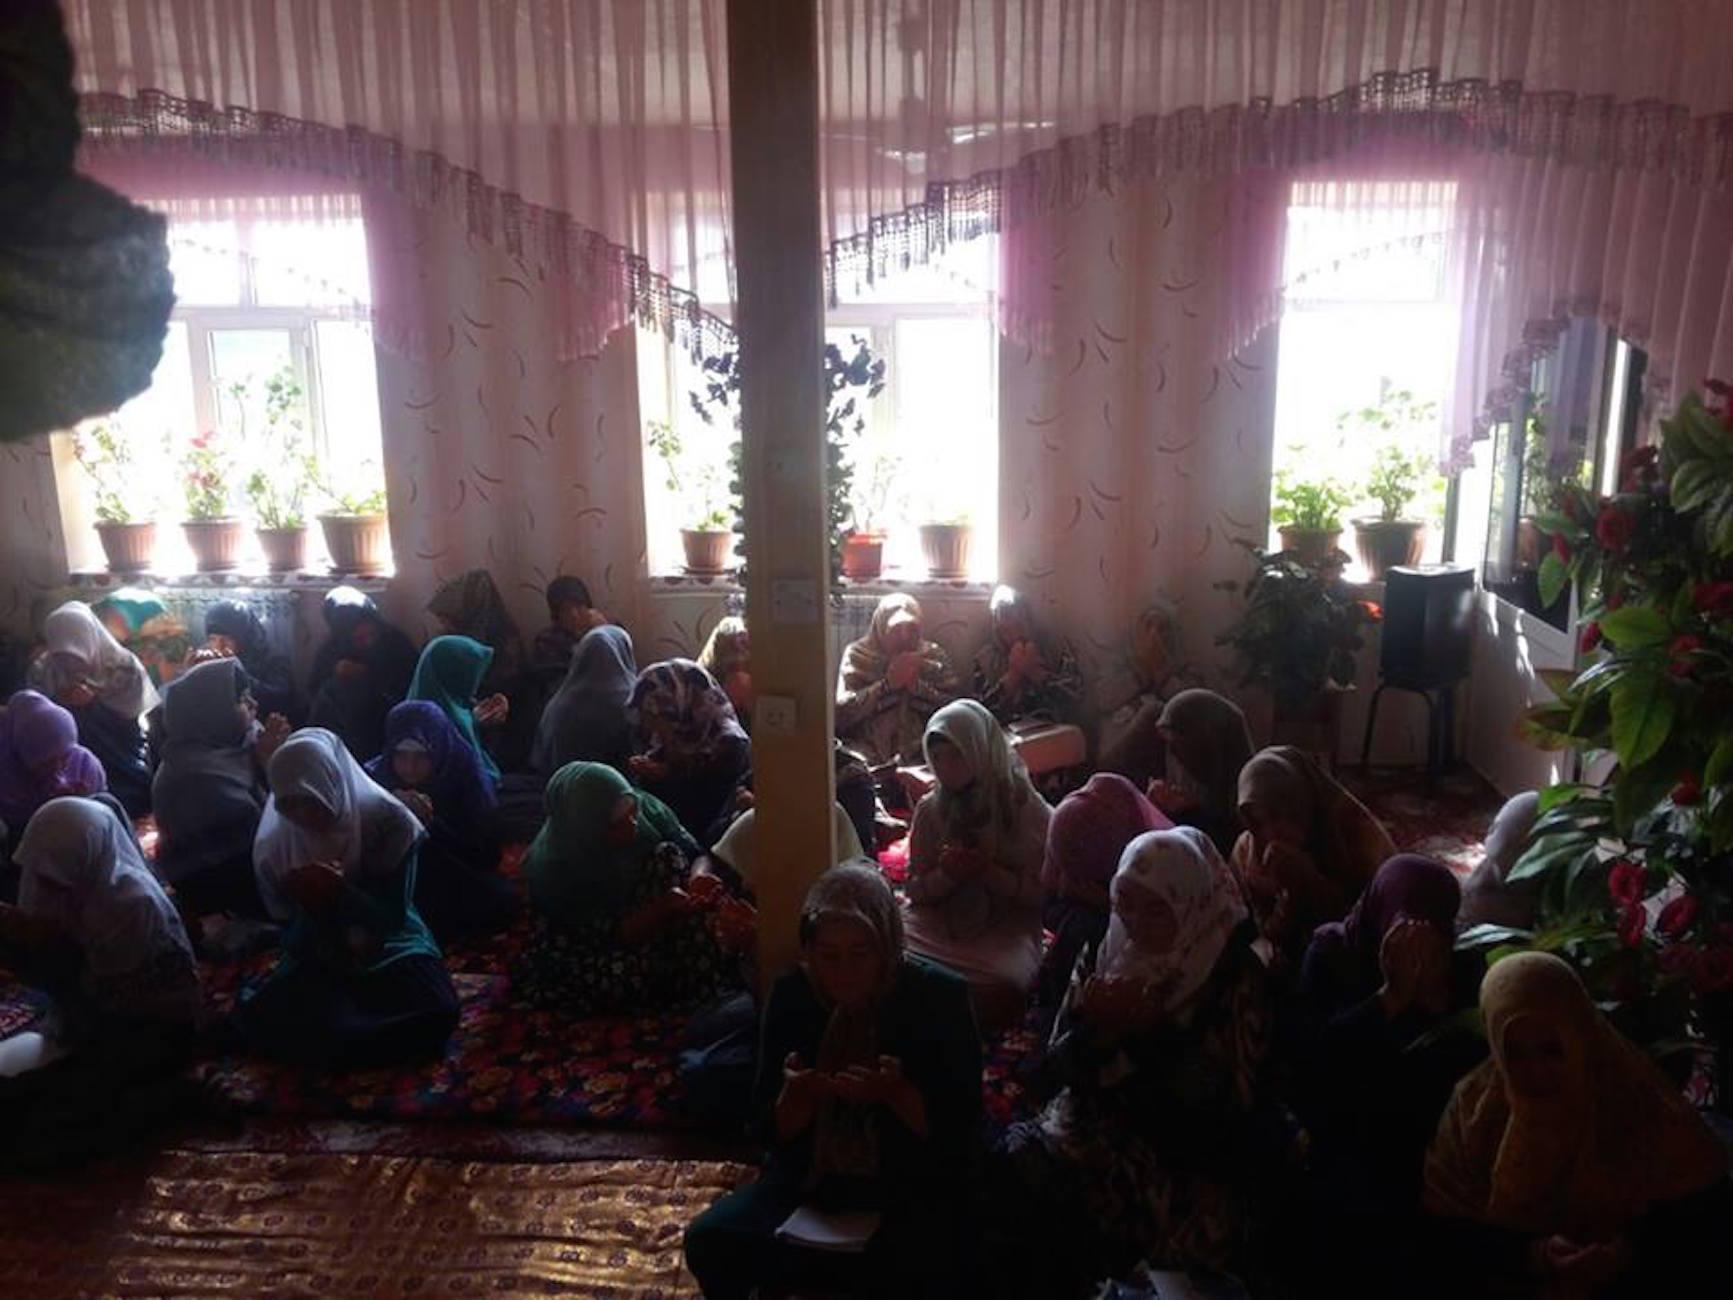 Kyrgyzstan convicts Hizb ut-Tahrir woman activist